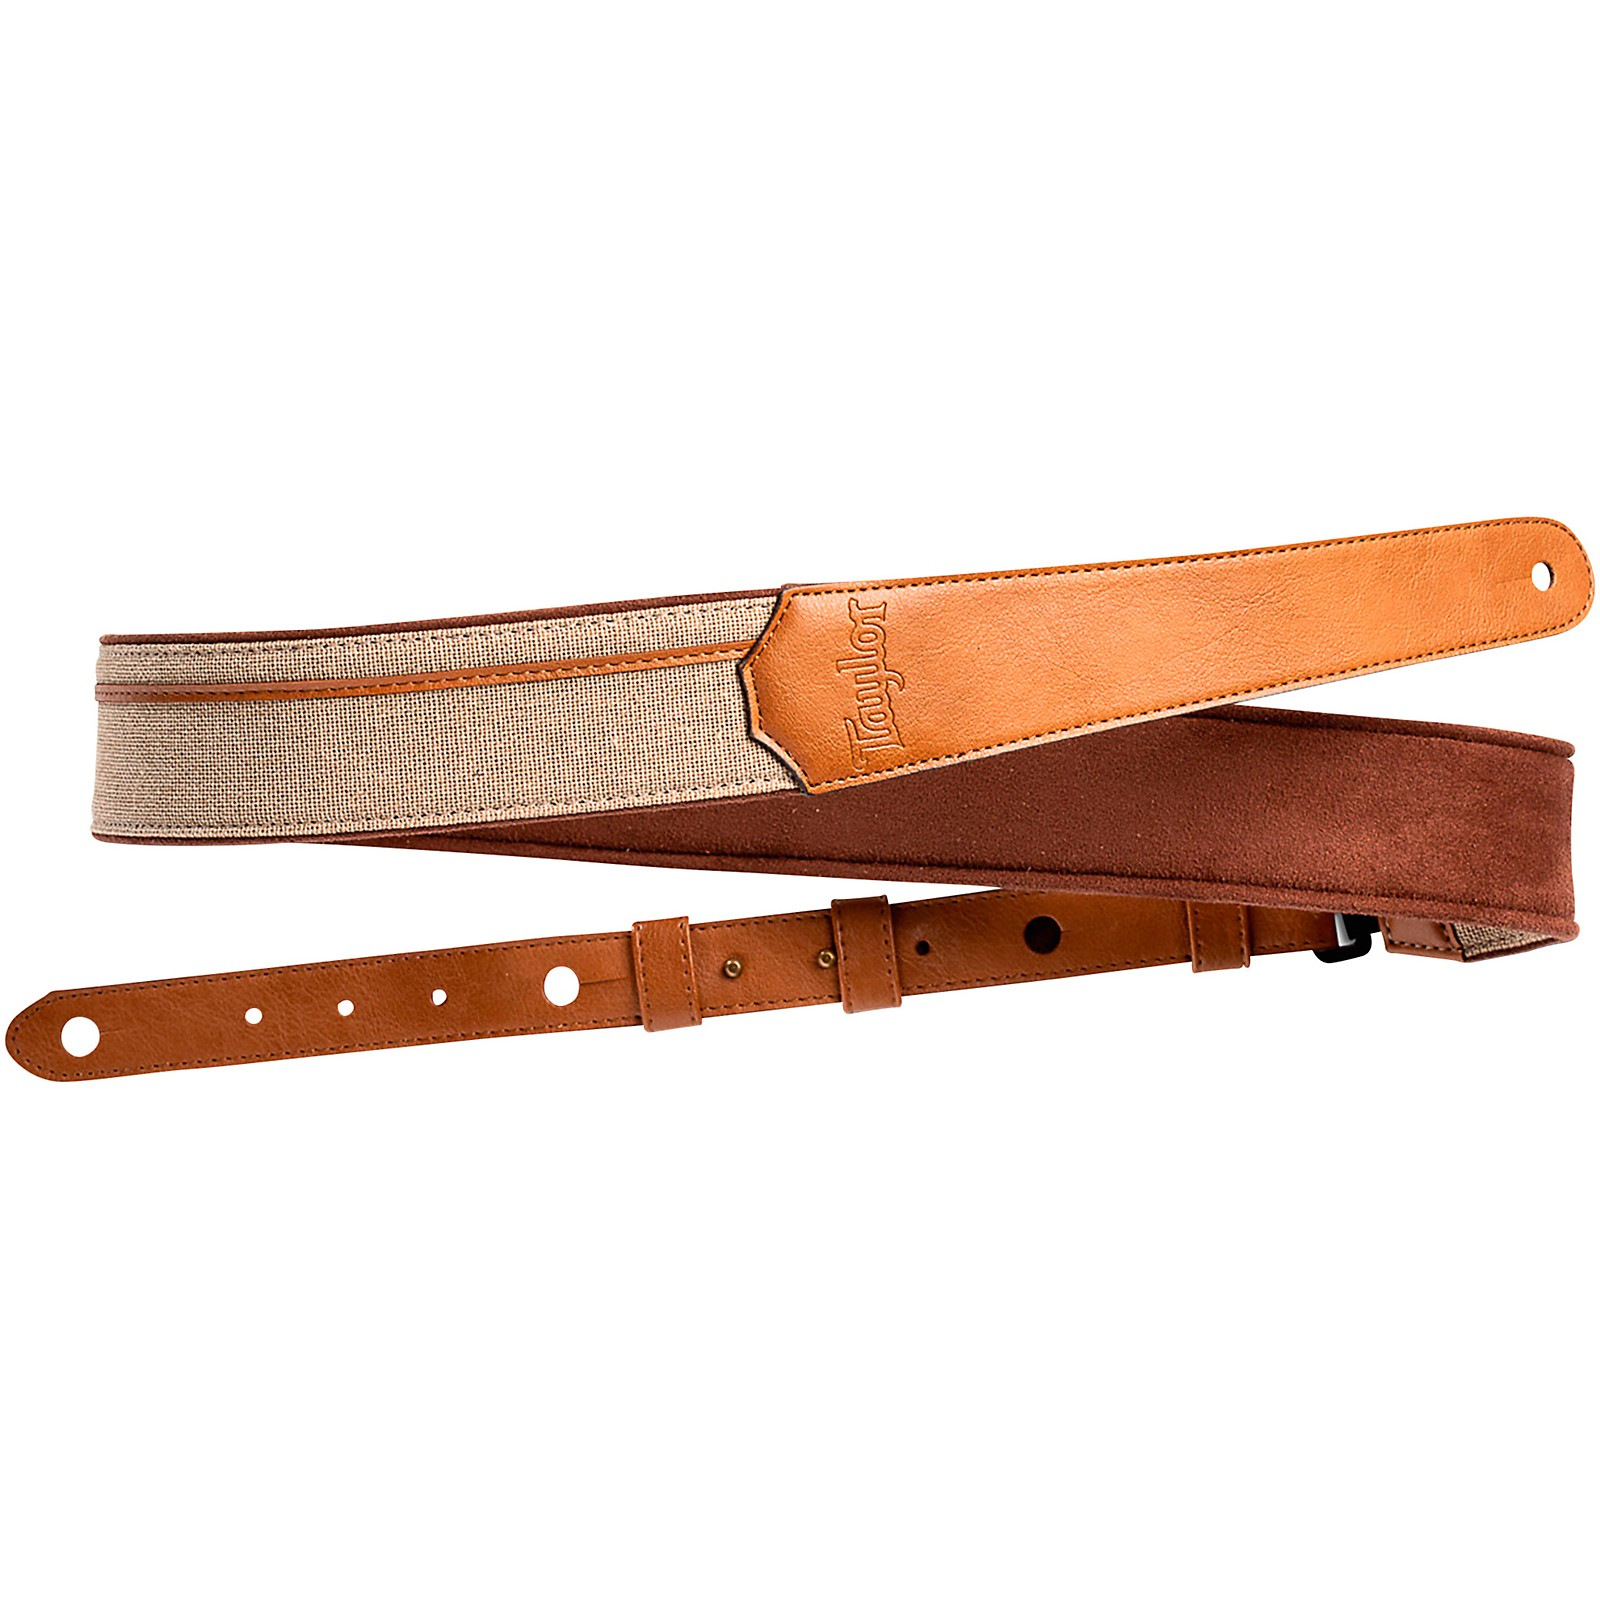 Taylor Vegan Leather Guitar Strap